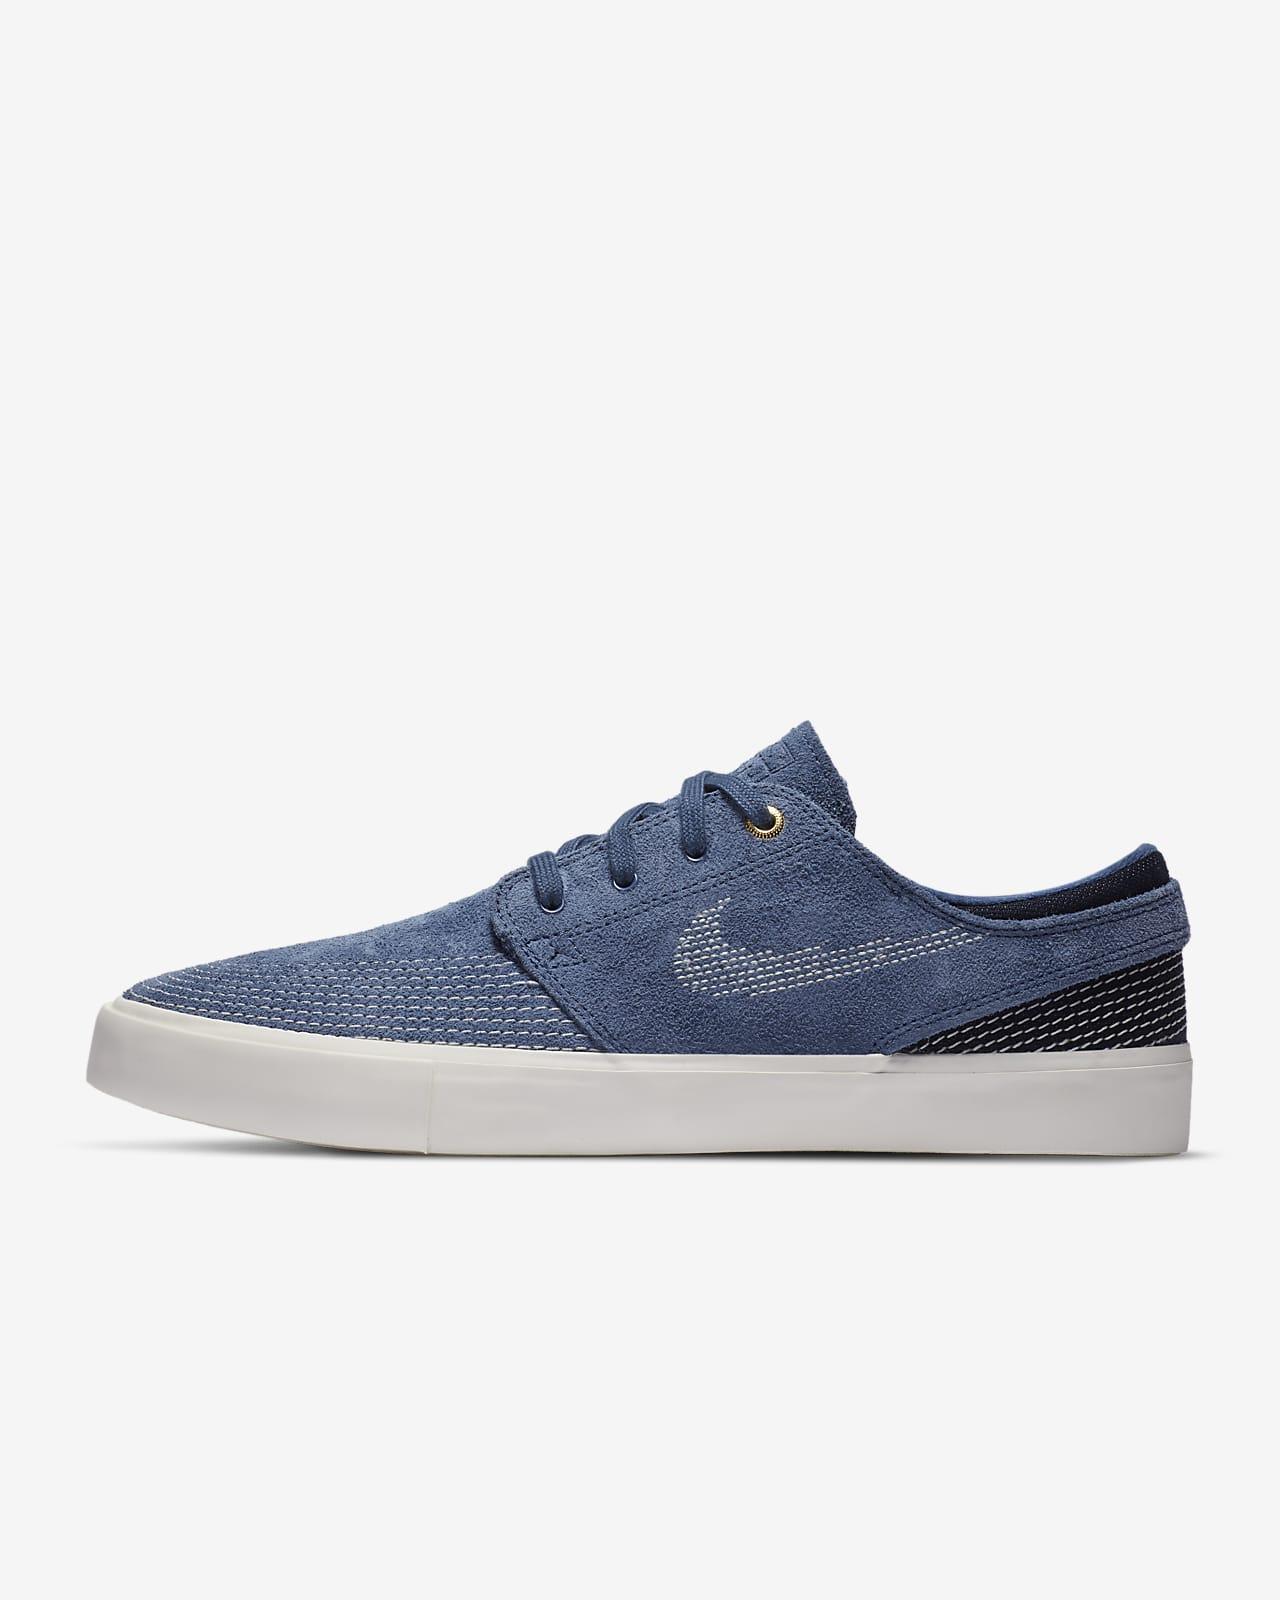 Calzado de skateboarding Nike SB Zoom Stefan Janoski RM Premium